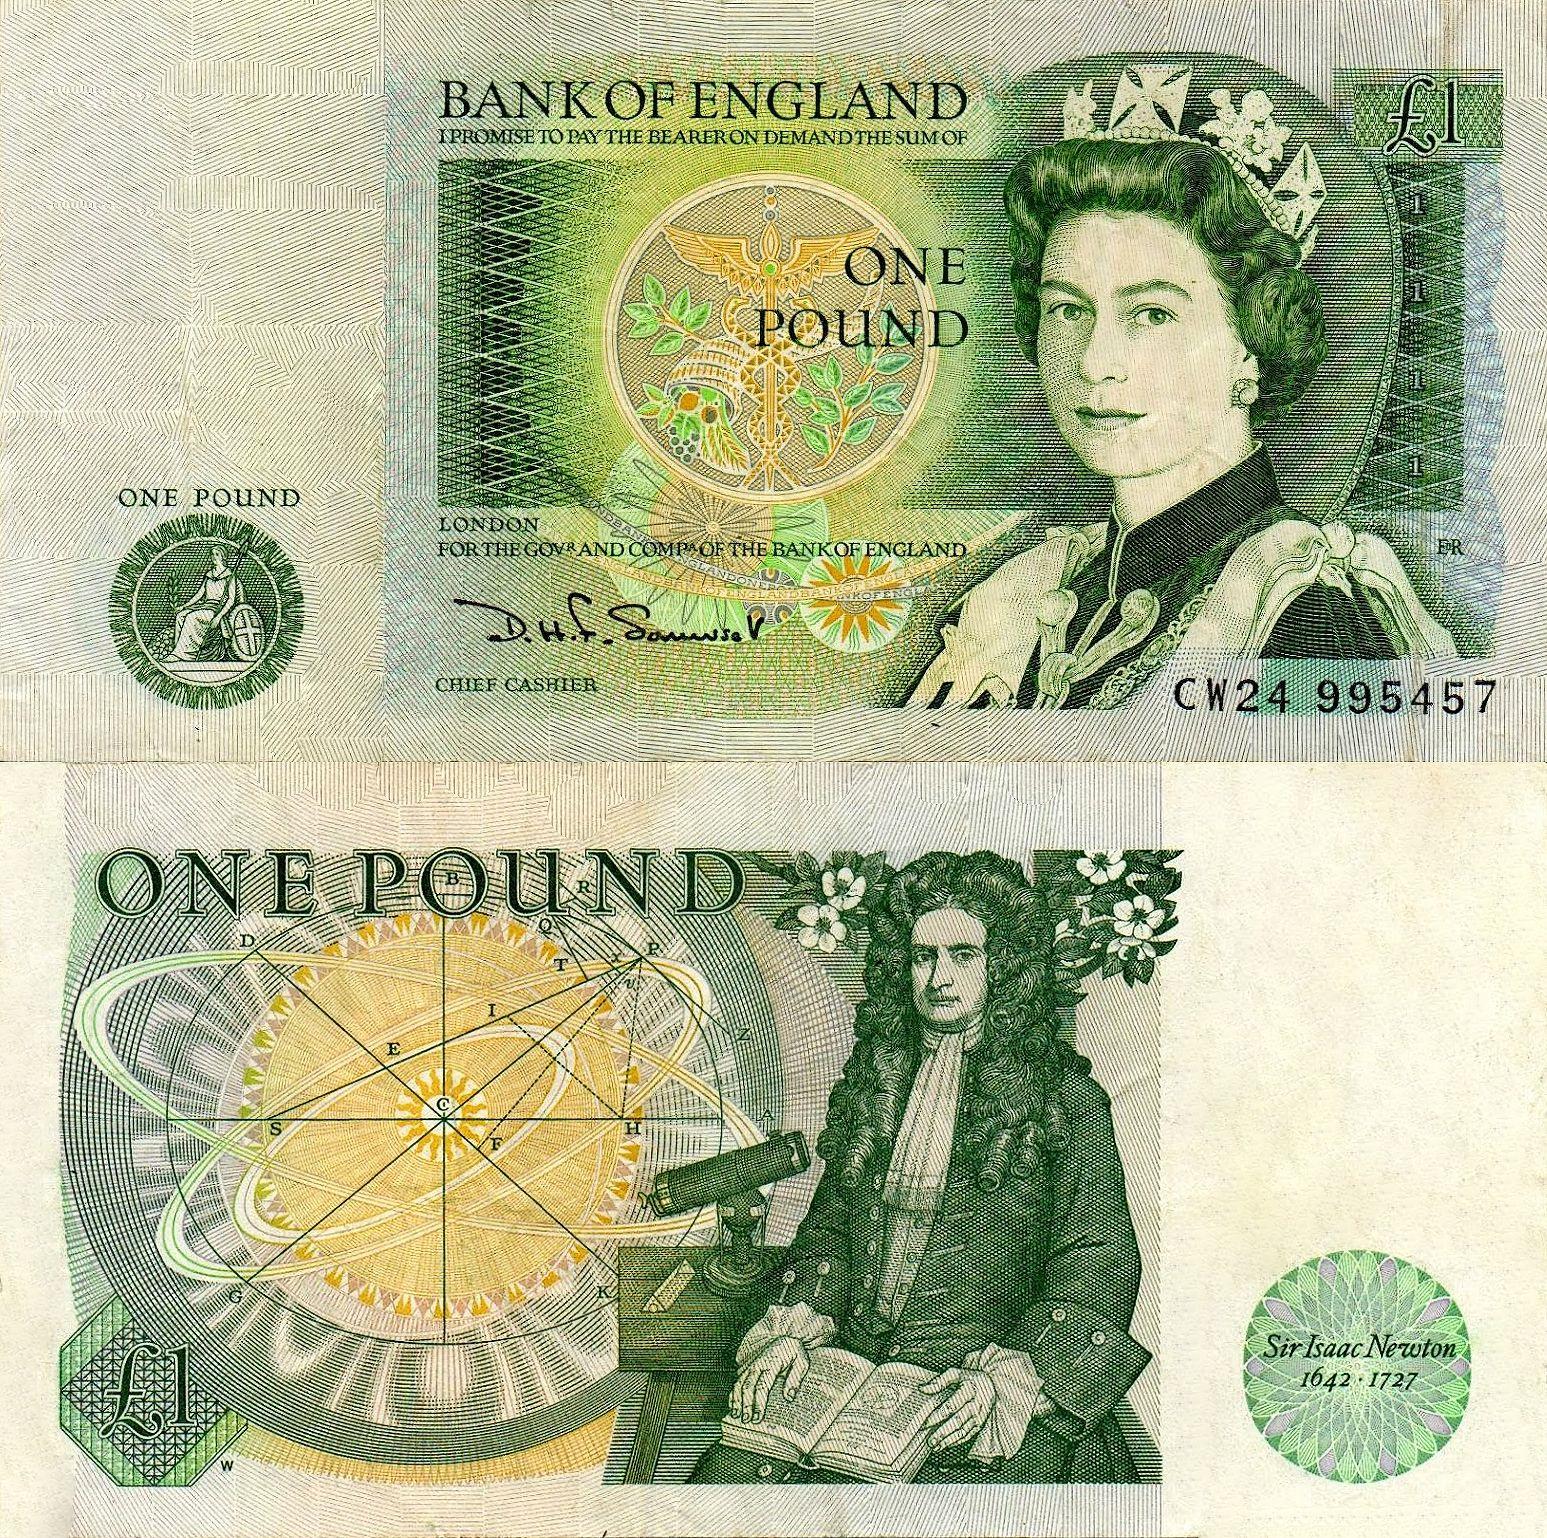 Reino Unido 1 Libra Esterlina 1971 Motivo Isaac Newton Money Collection Star Wars Movies Posters Money Notes